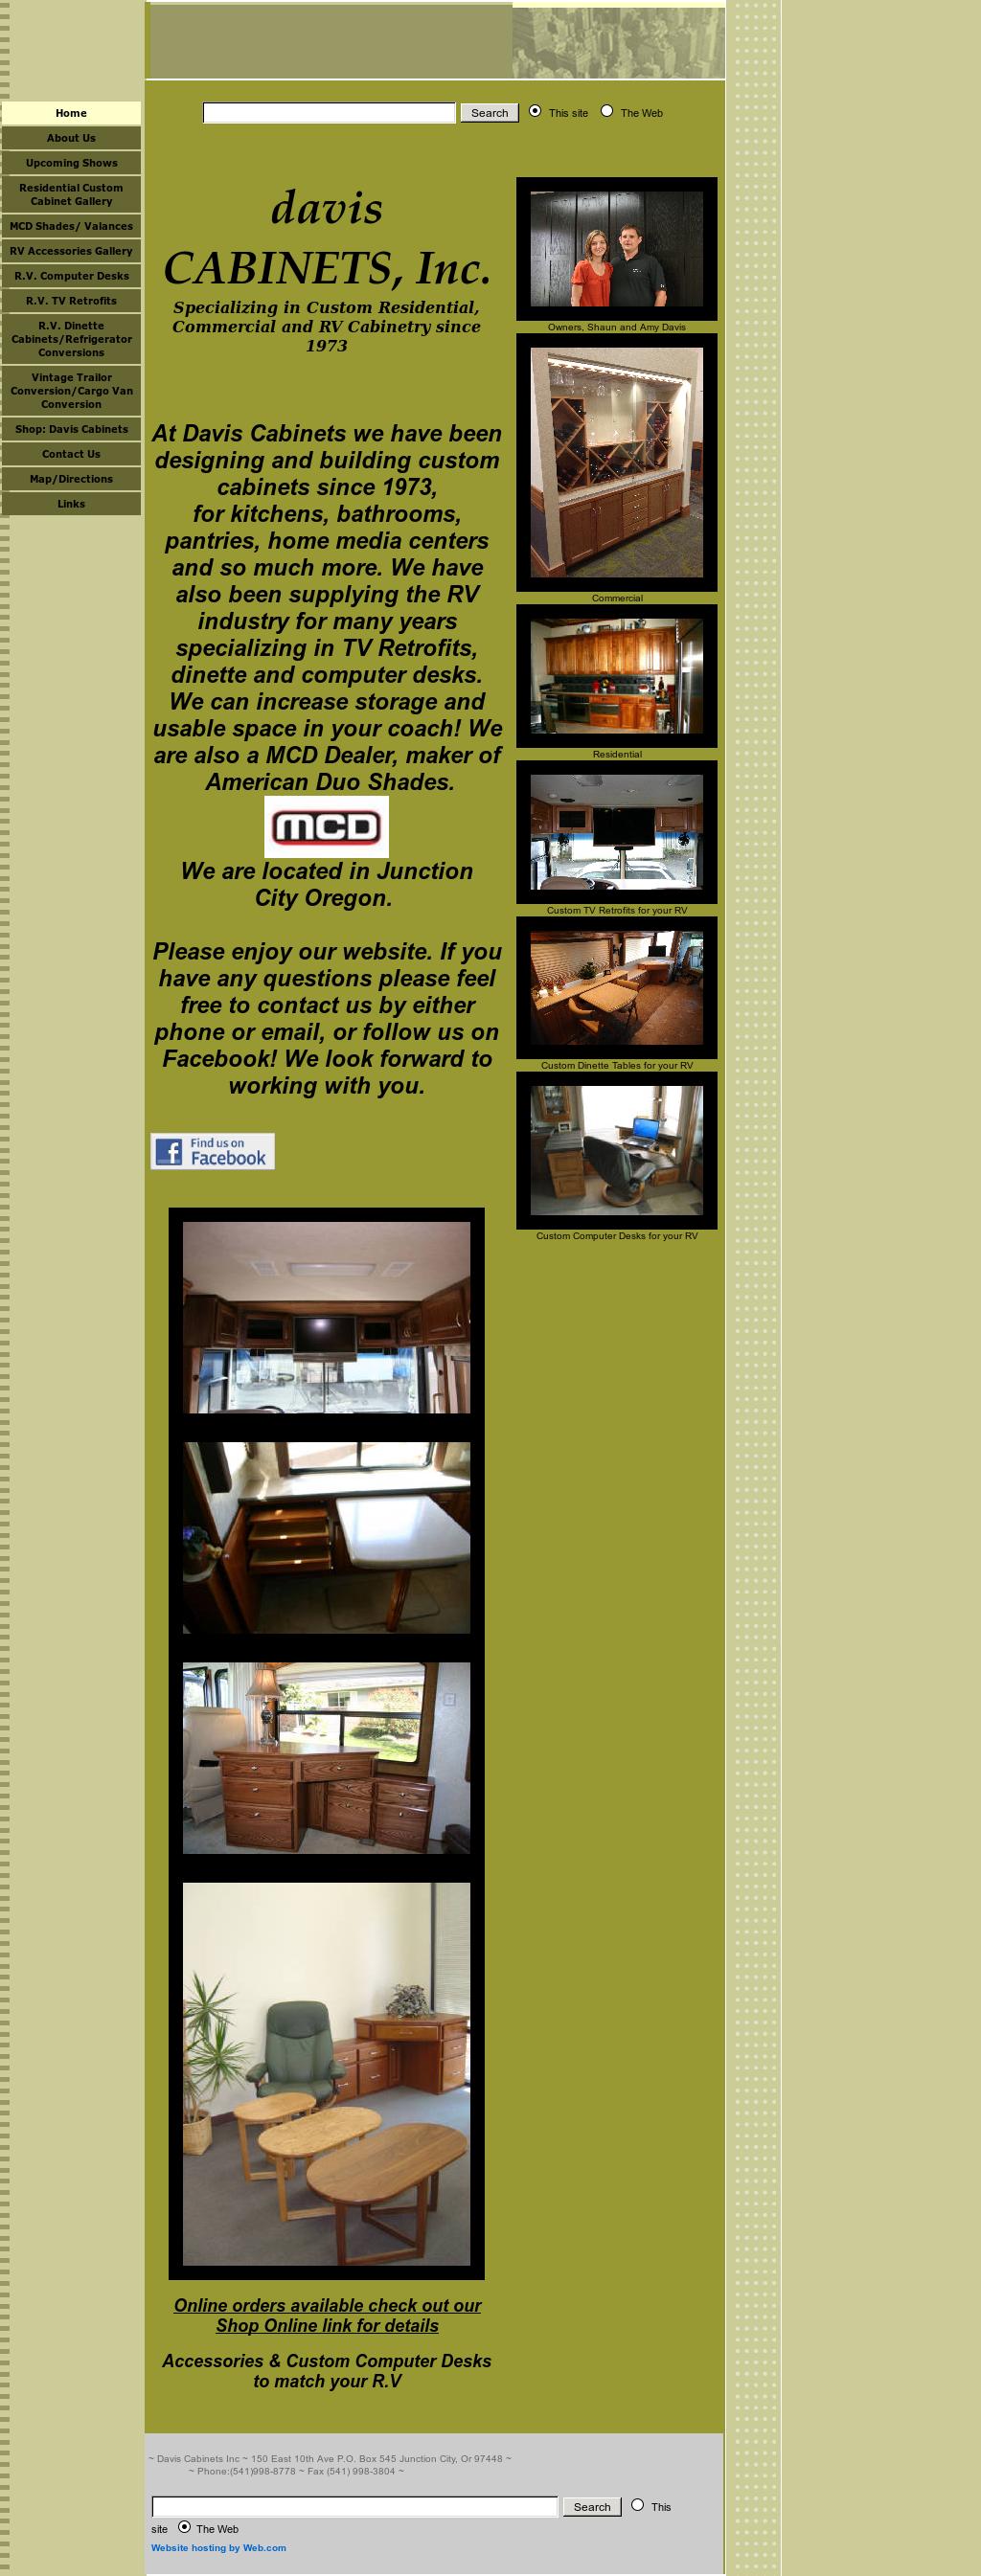 Davis Cabinets Website History